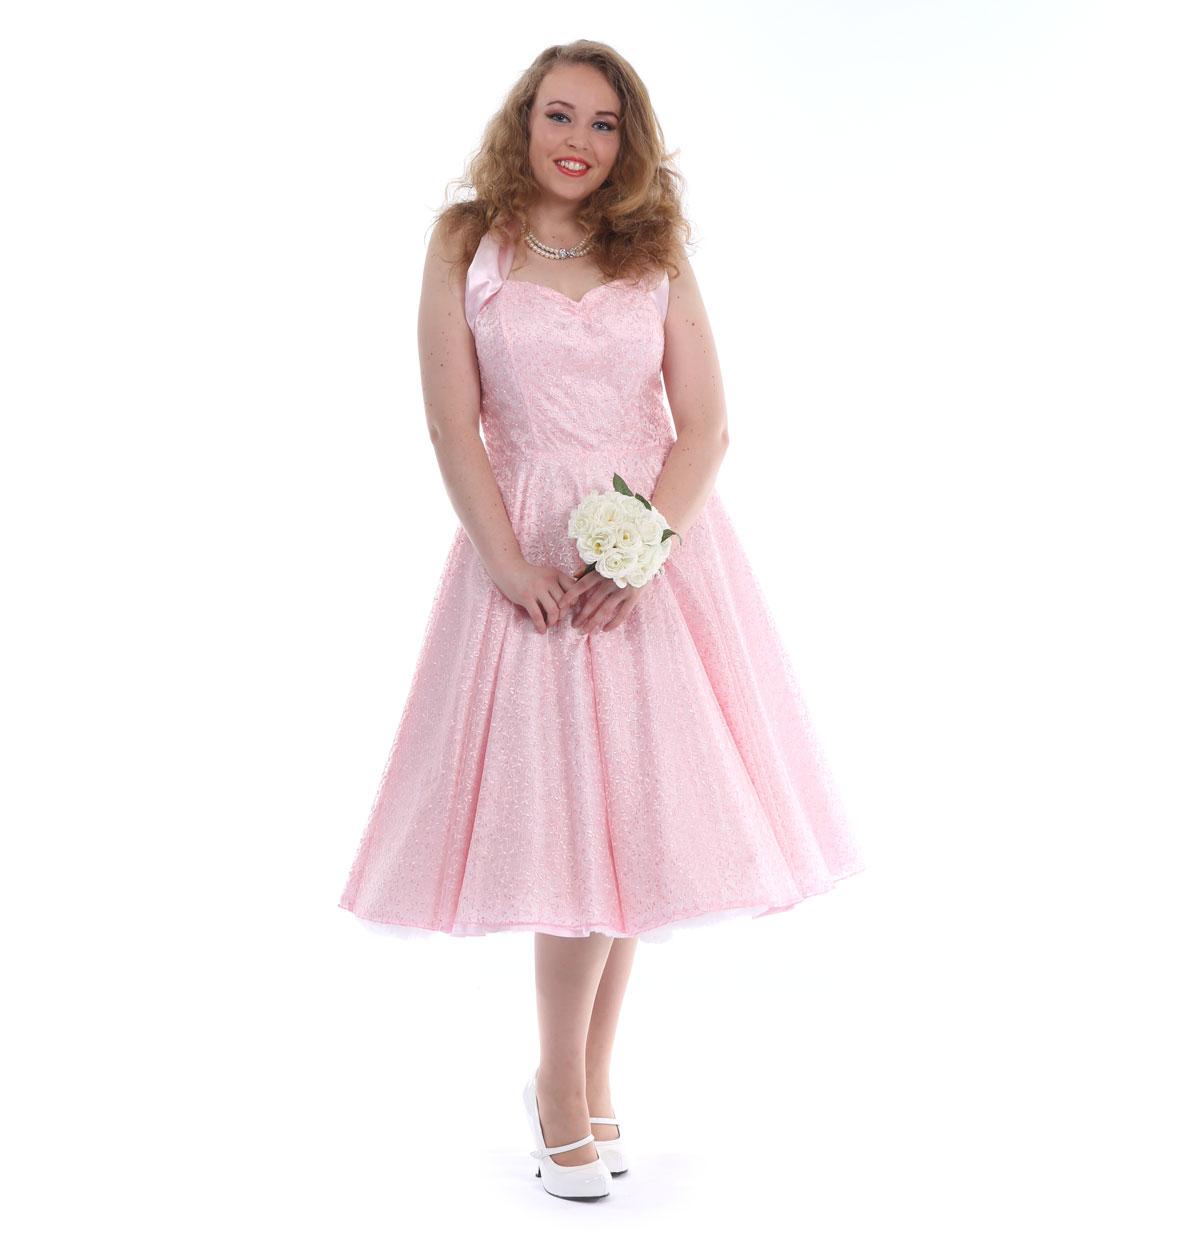 Vivien Of Holloway Ivy Lace Satijnen Jurk Roze